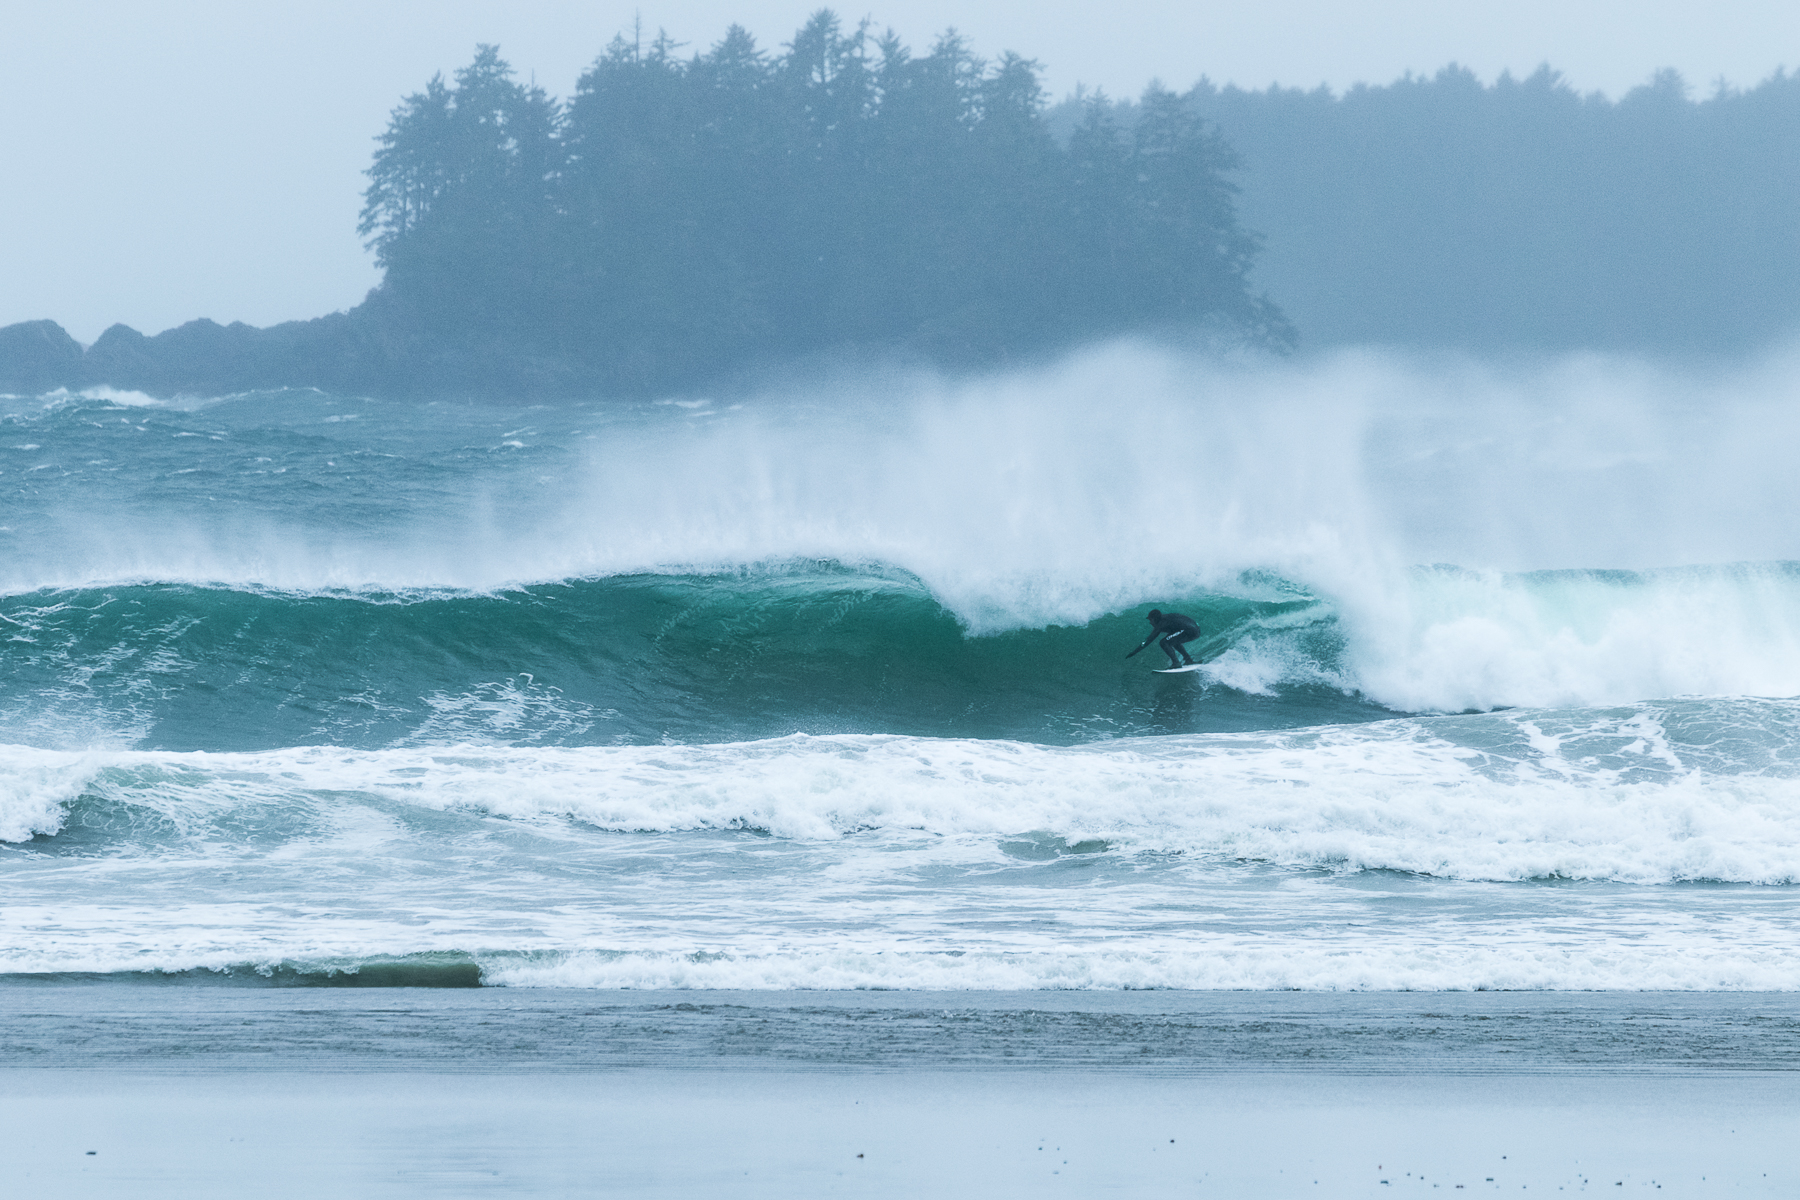 tofino_surf_photography-Frazer_Mayor-Winter_storm-Oneill.jpg